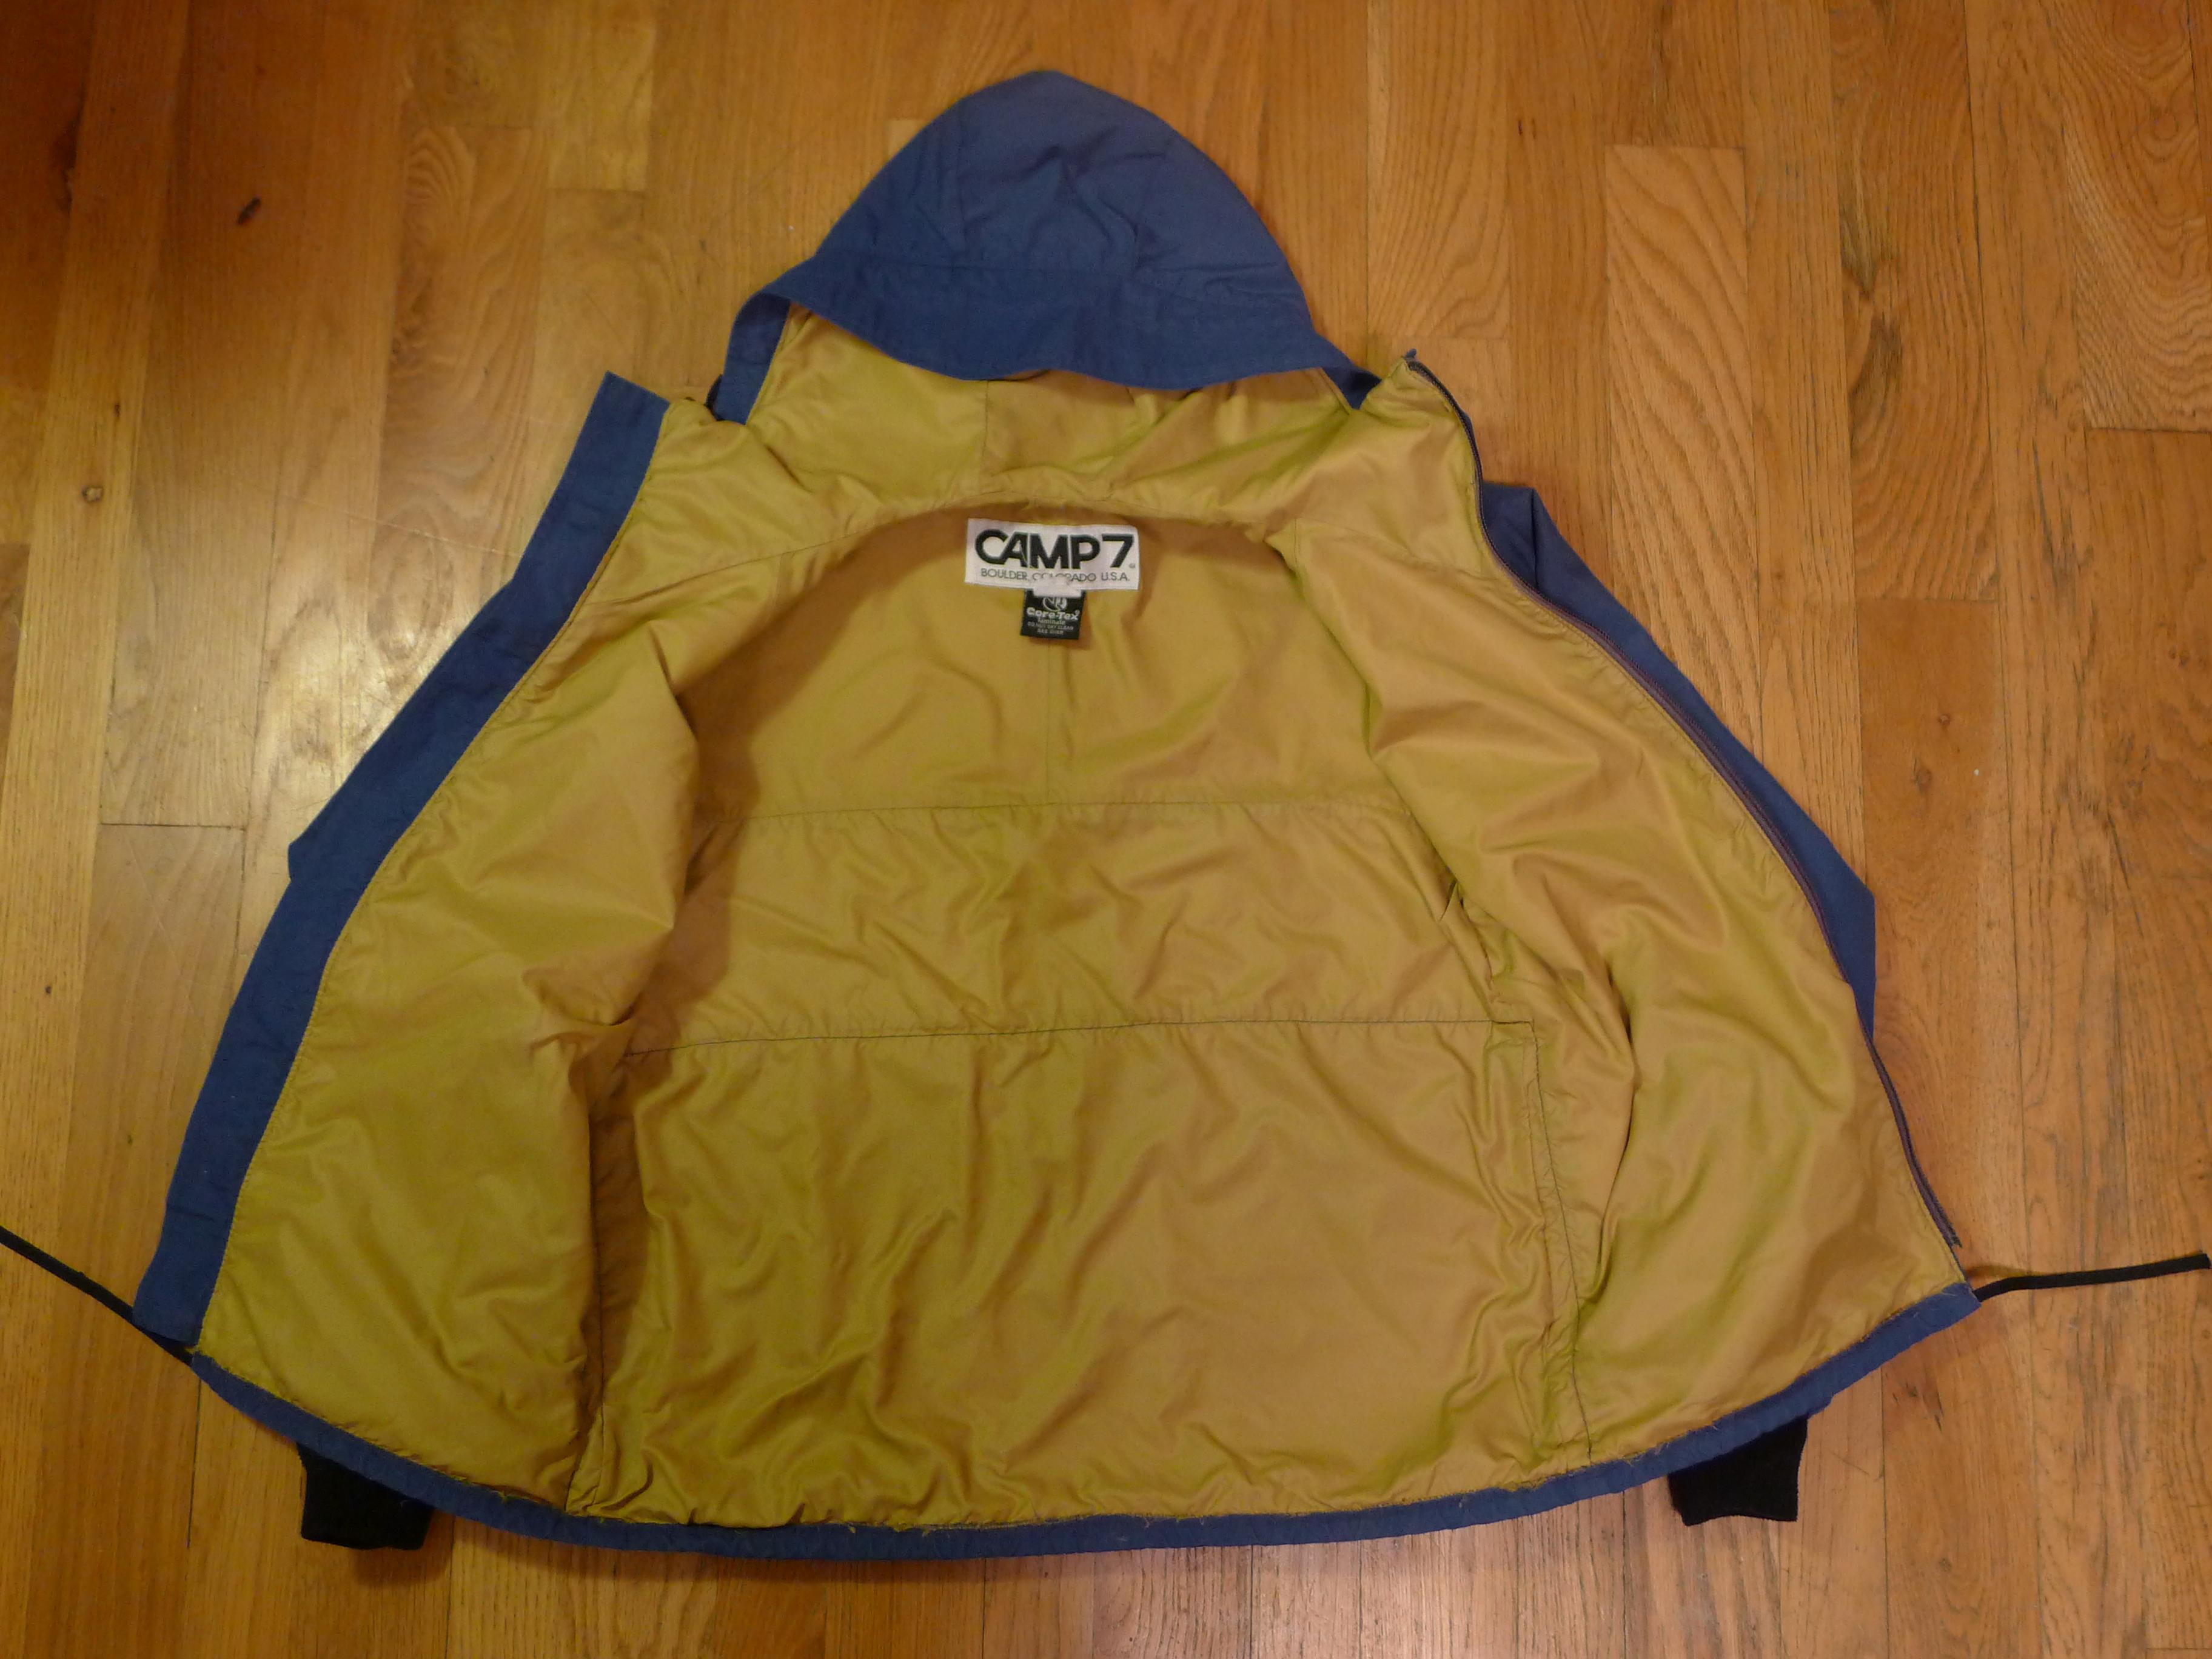 Viintage Camp 7 Puffy Coat DbcSe